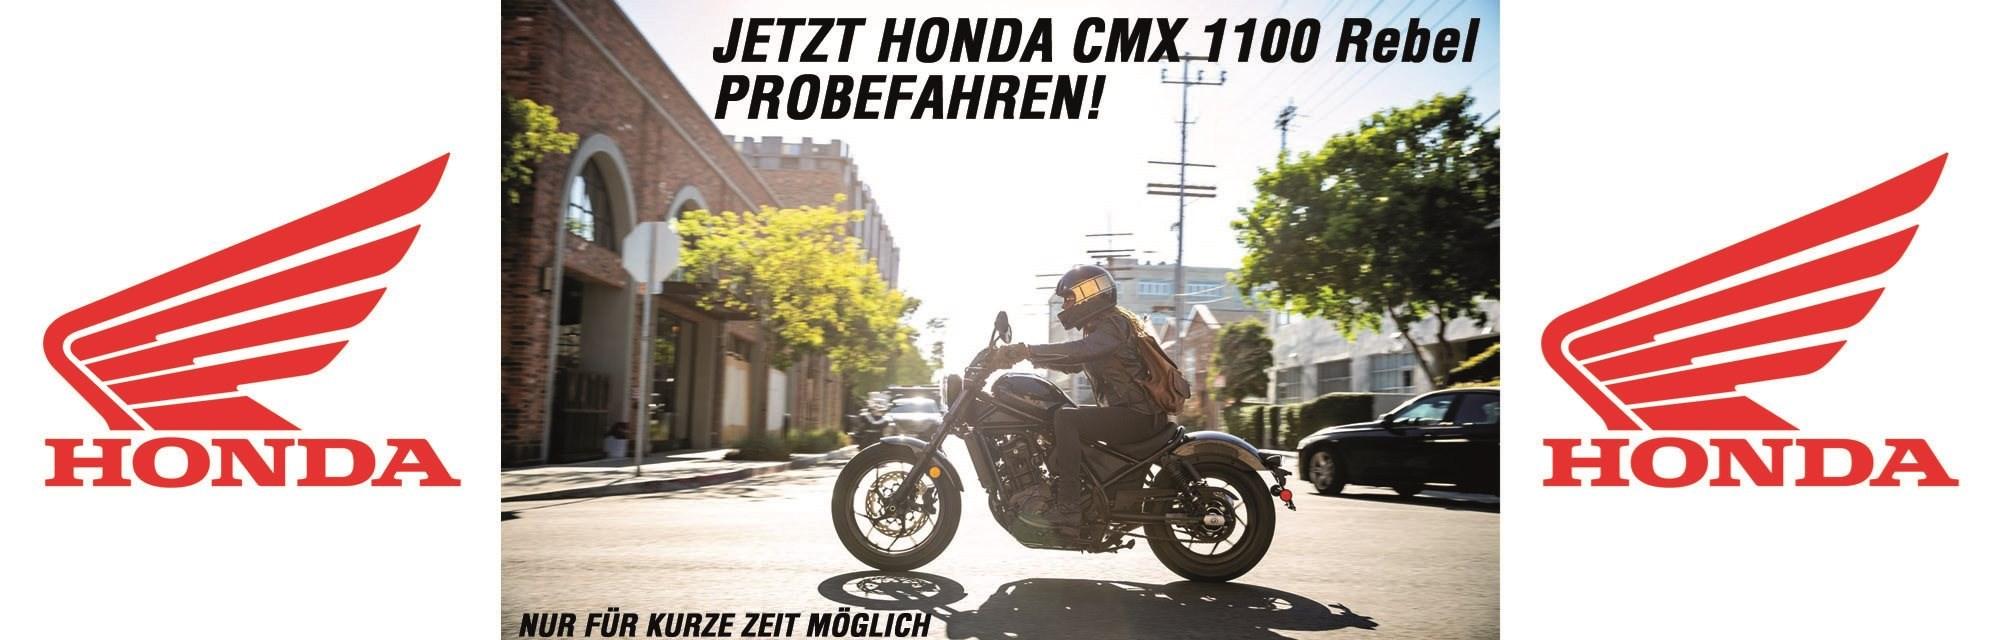 Jetzt Probefahrt CMX 1100 Rebel